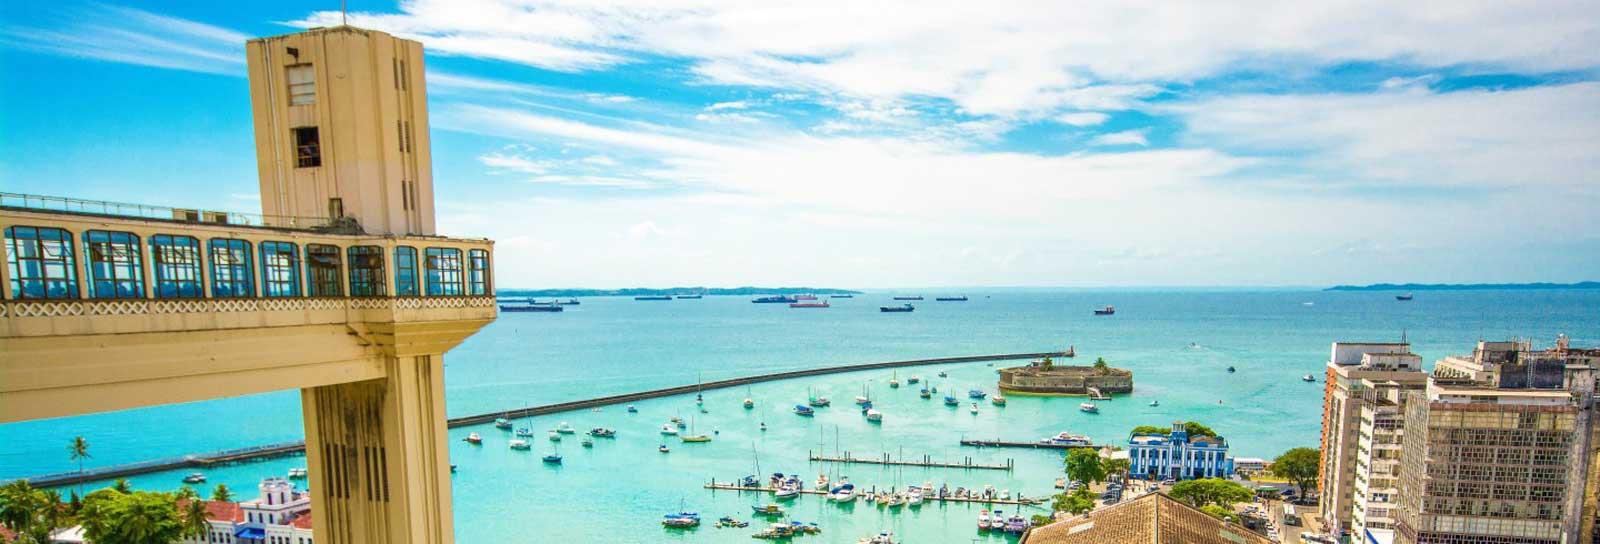 Beach Honeymoon in Brazil, Let Us Organise Your Beach Honeymoon in Brazil